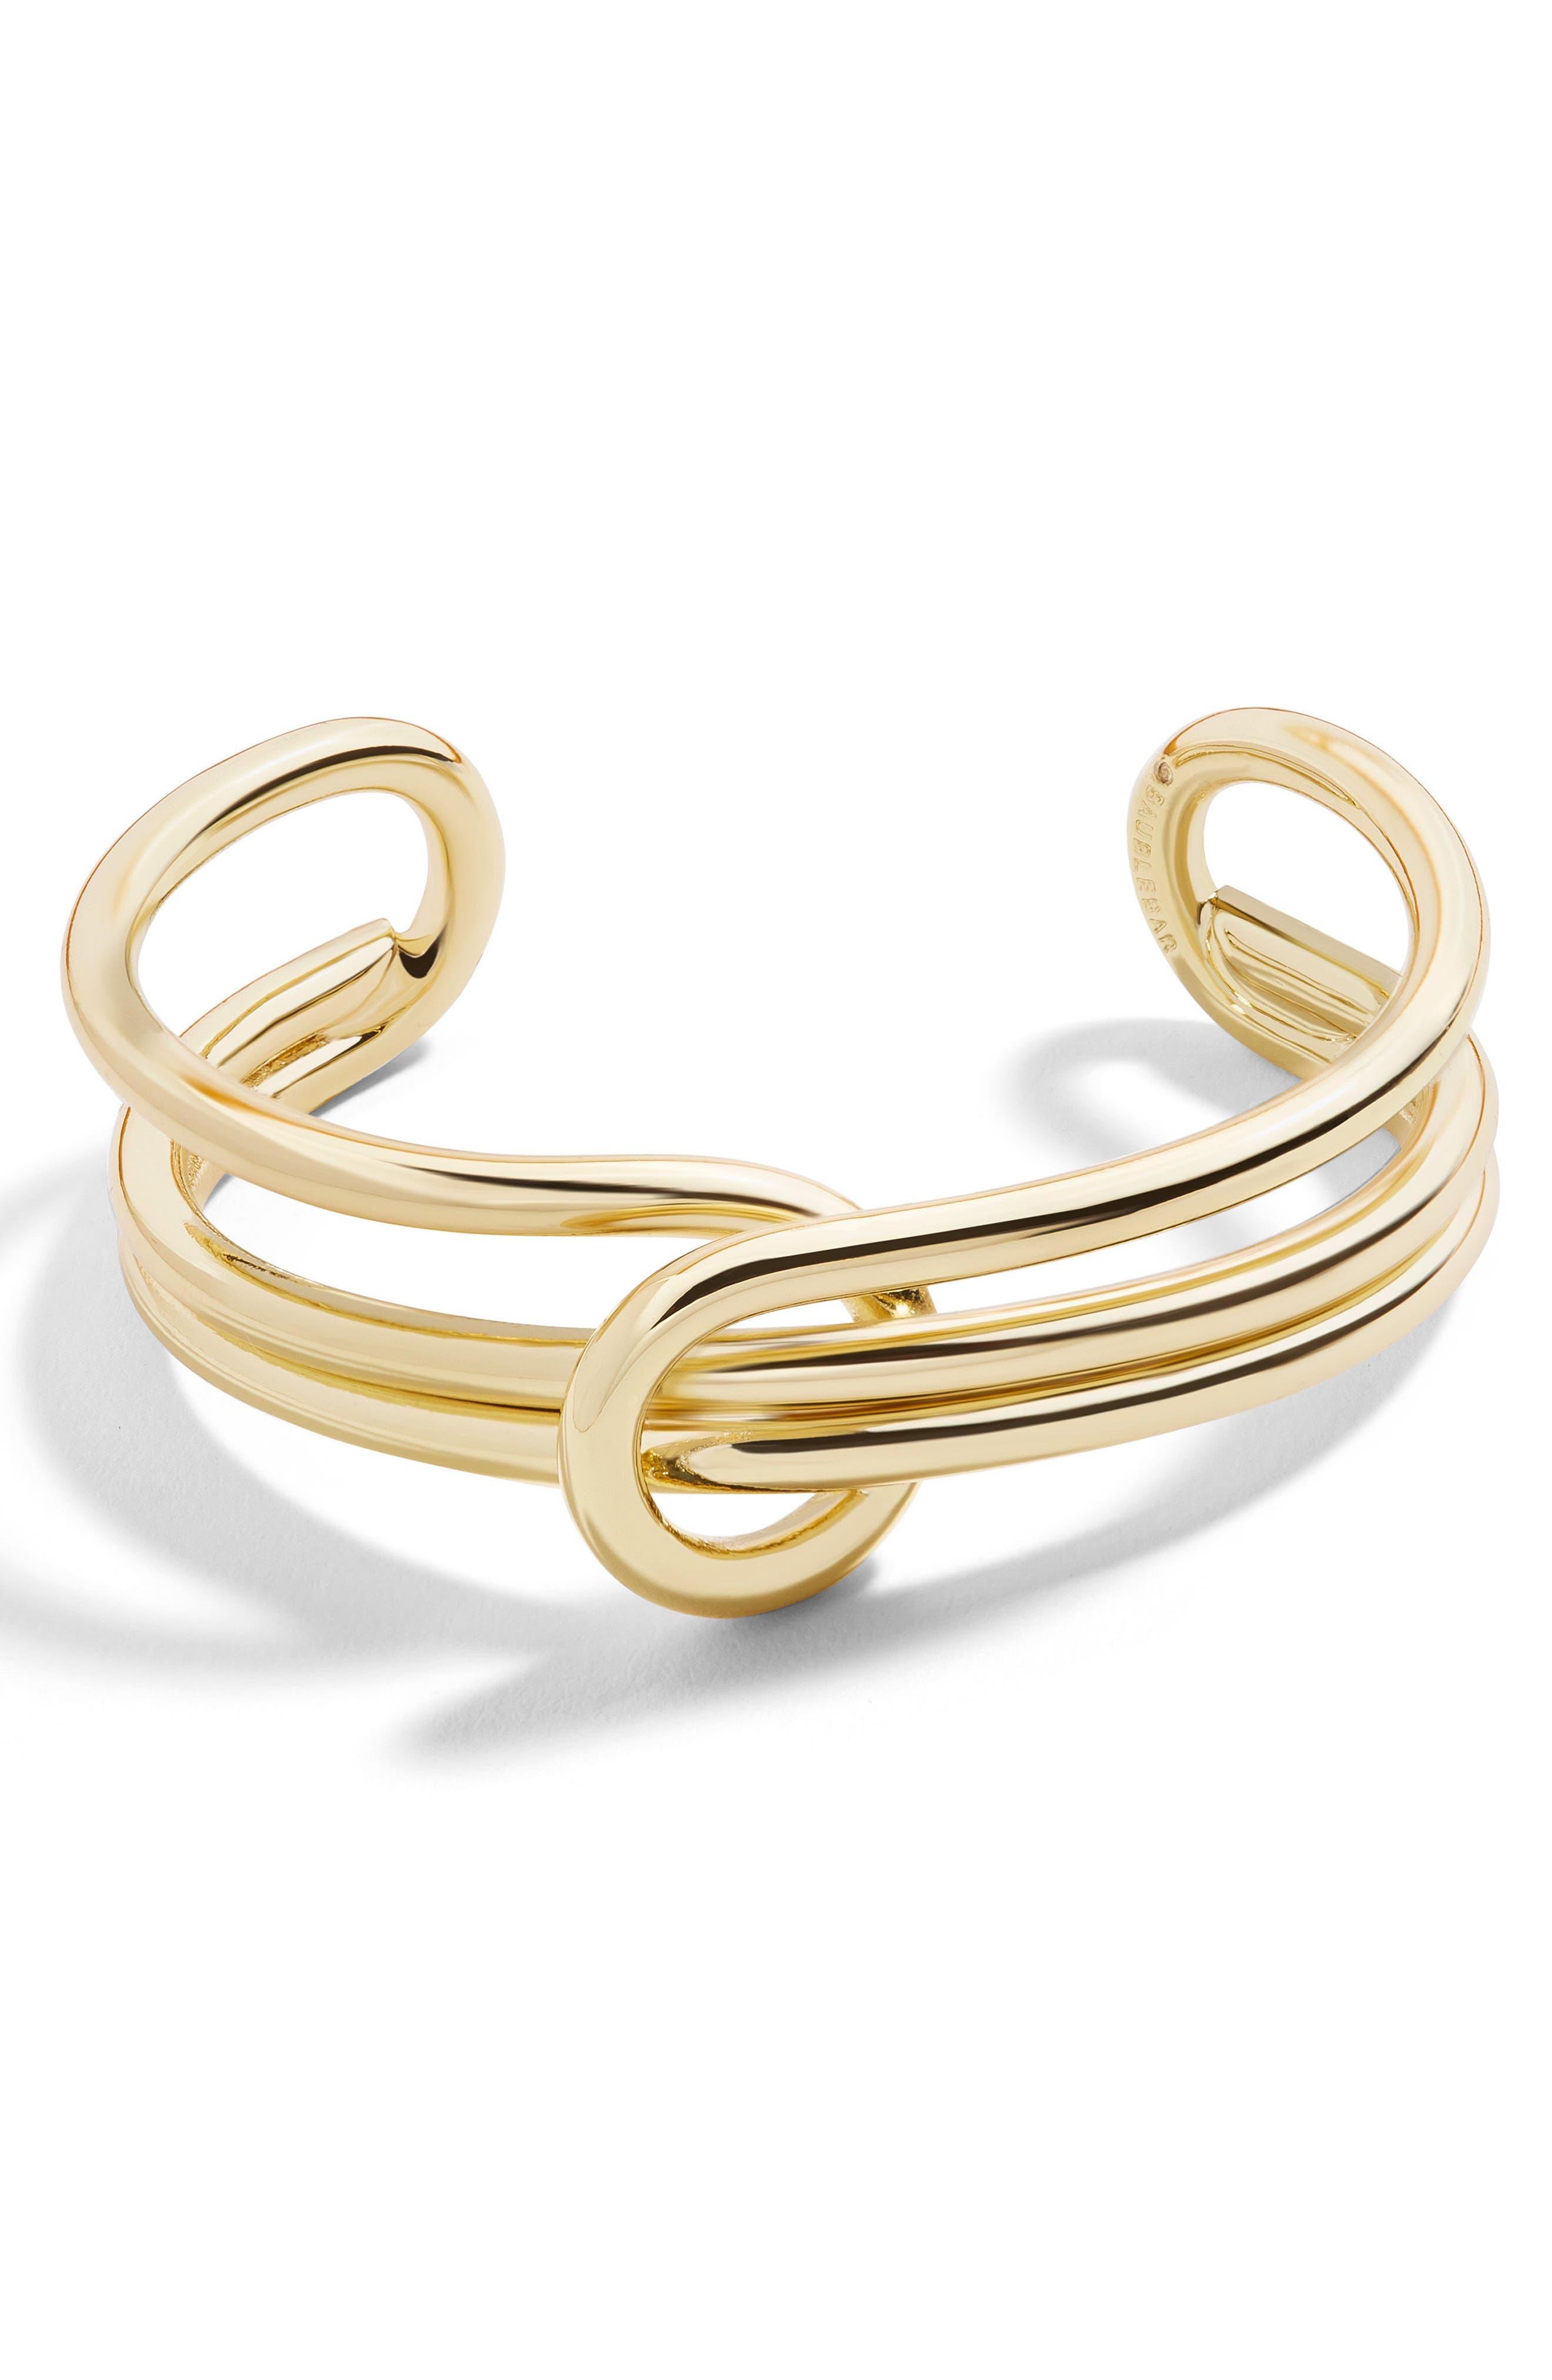 Shyanna Cuff Bracelet,                             Main thumbnail 1, color,                             Gold